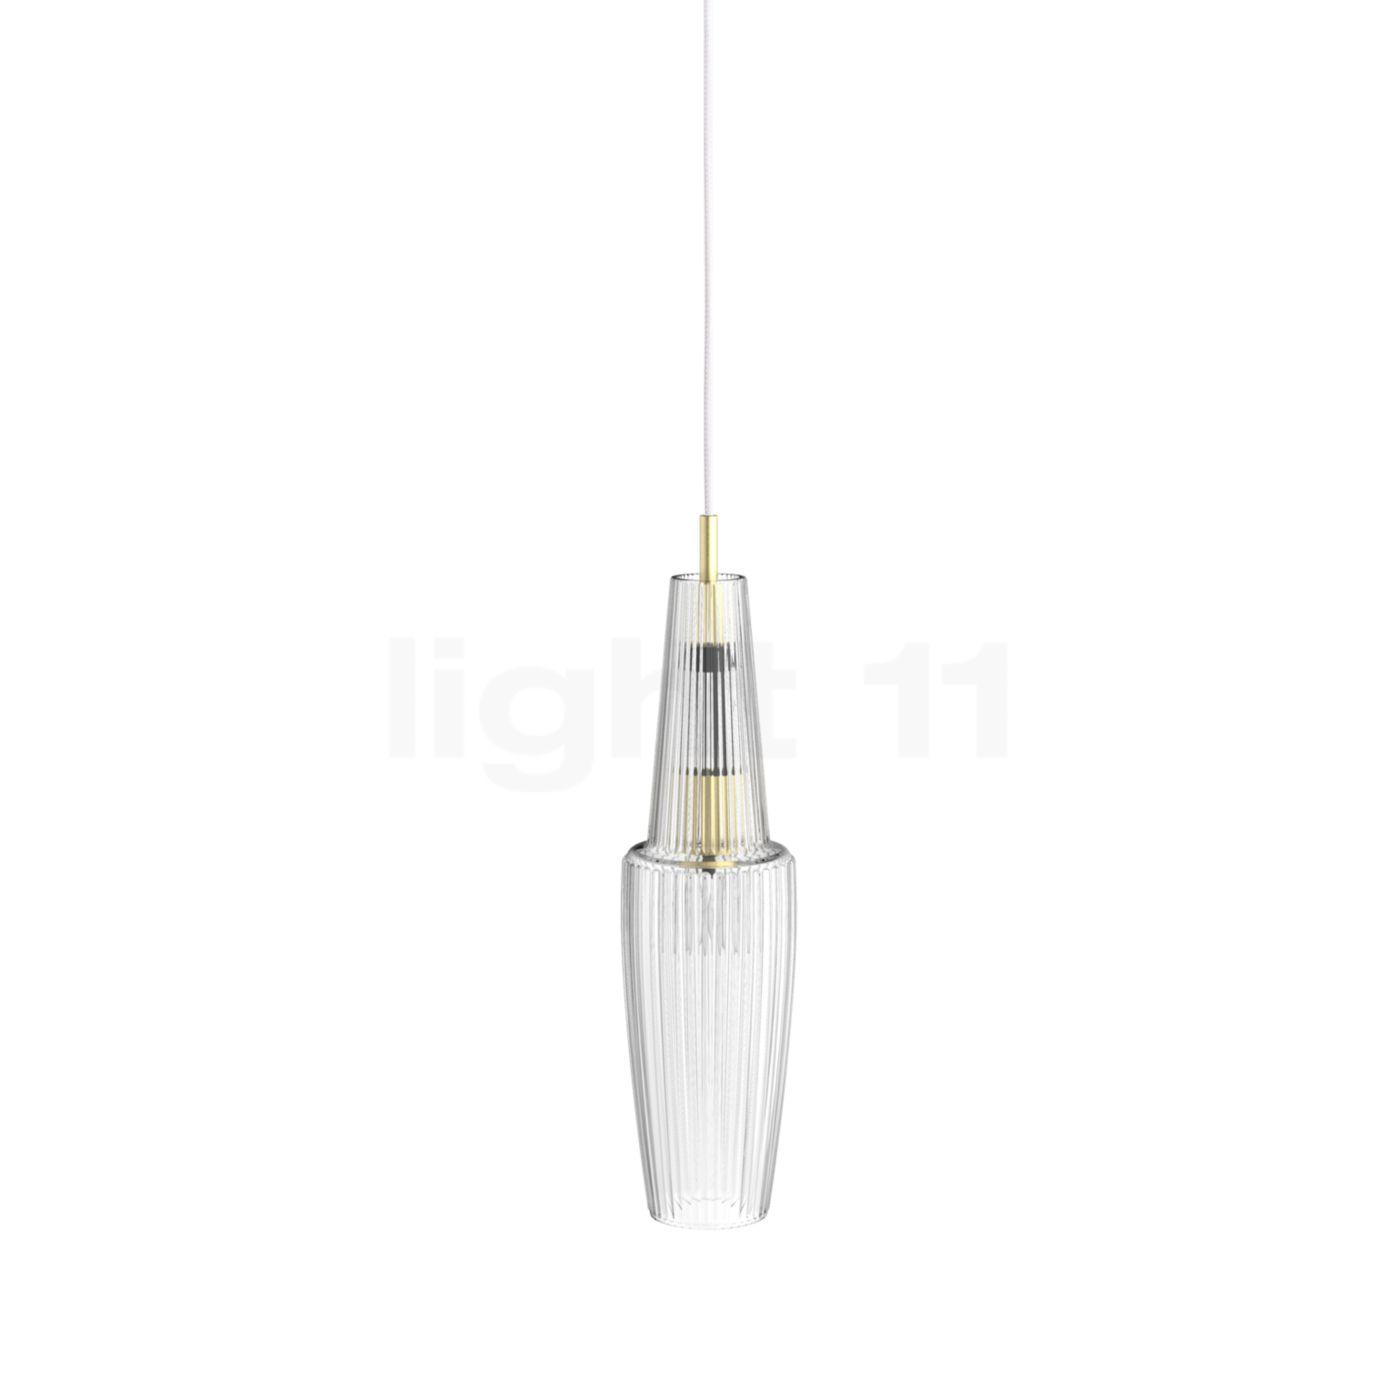 Mawa Gangkofner Pisa Pendelleuchte kristall, transparent, Kabel weiß/Messing gk-pi-cc-9016-me2-wt